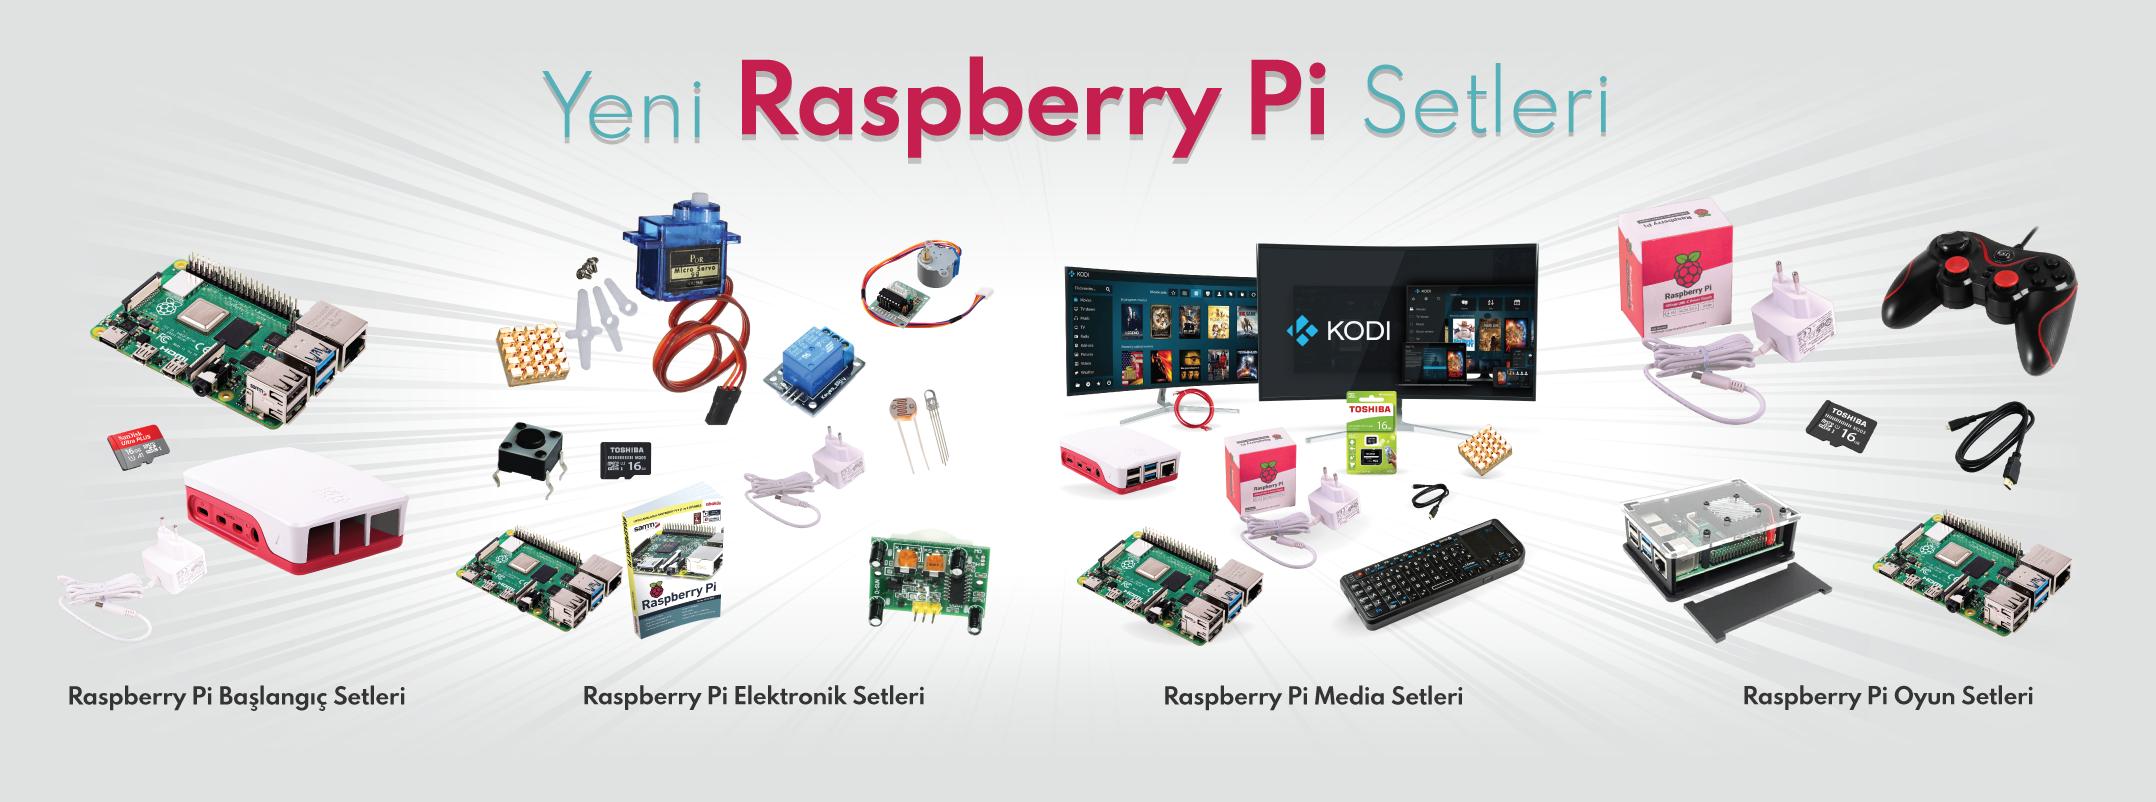 Raspberry Pi Setleri